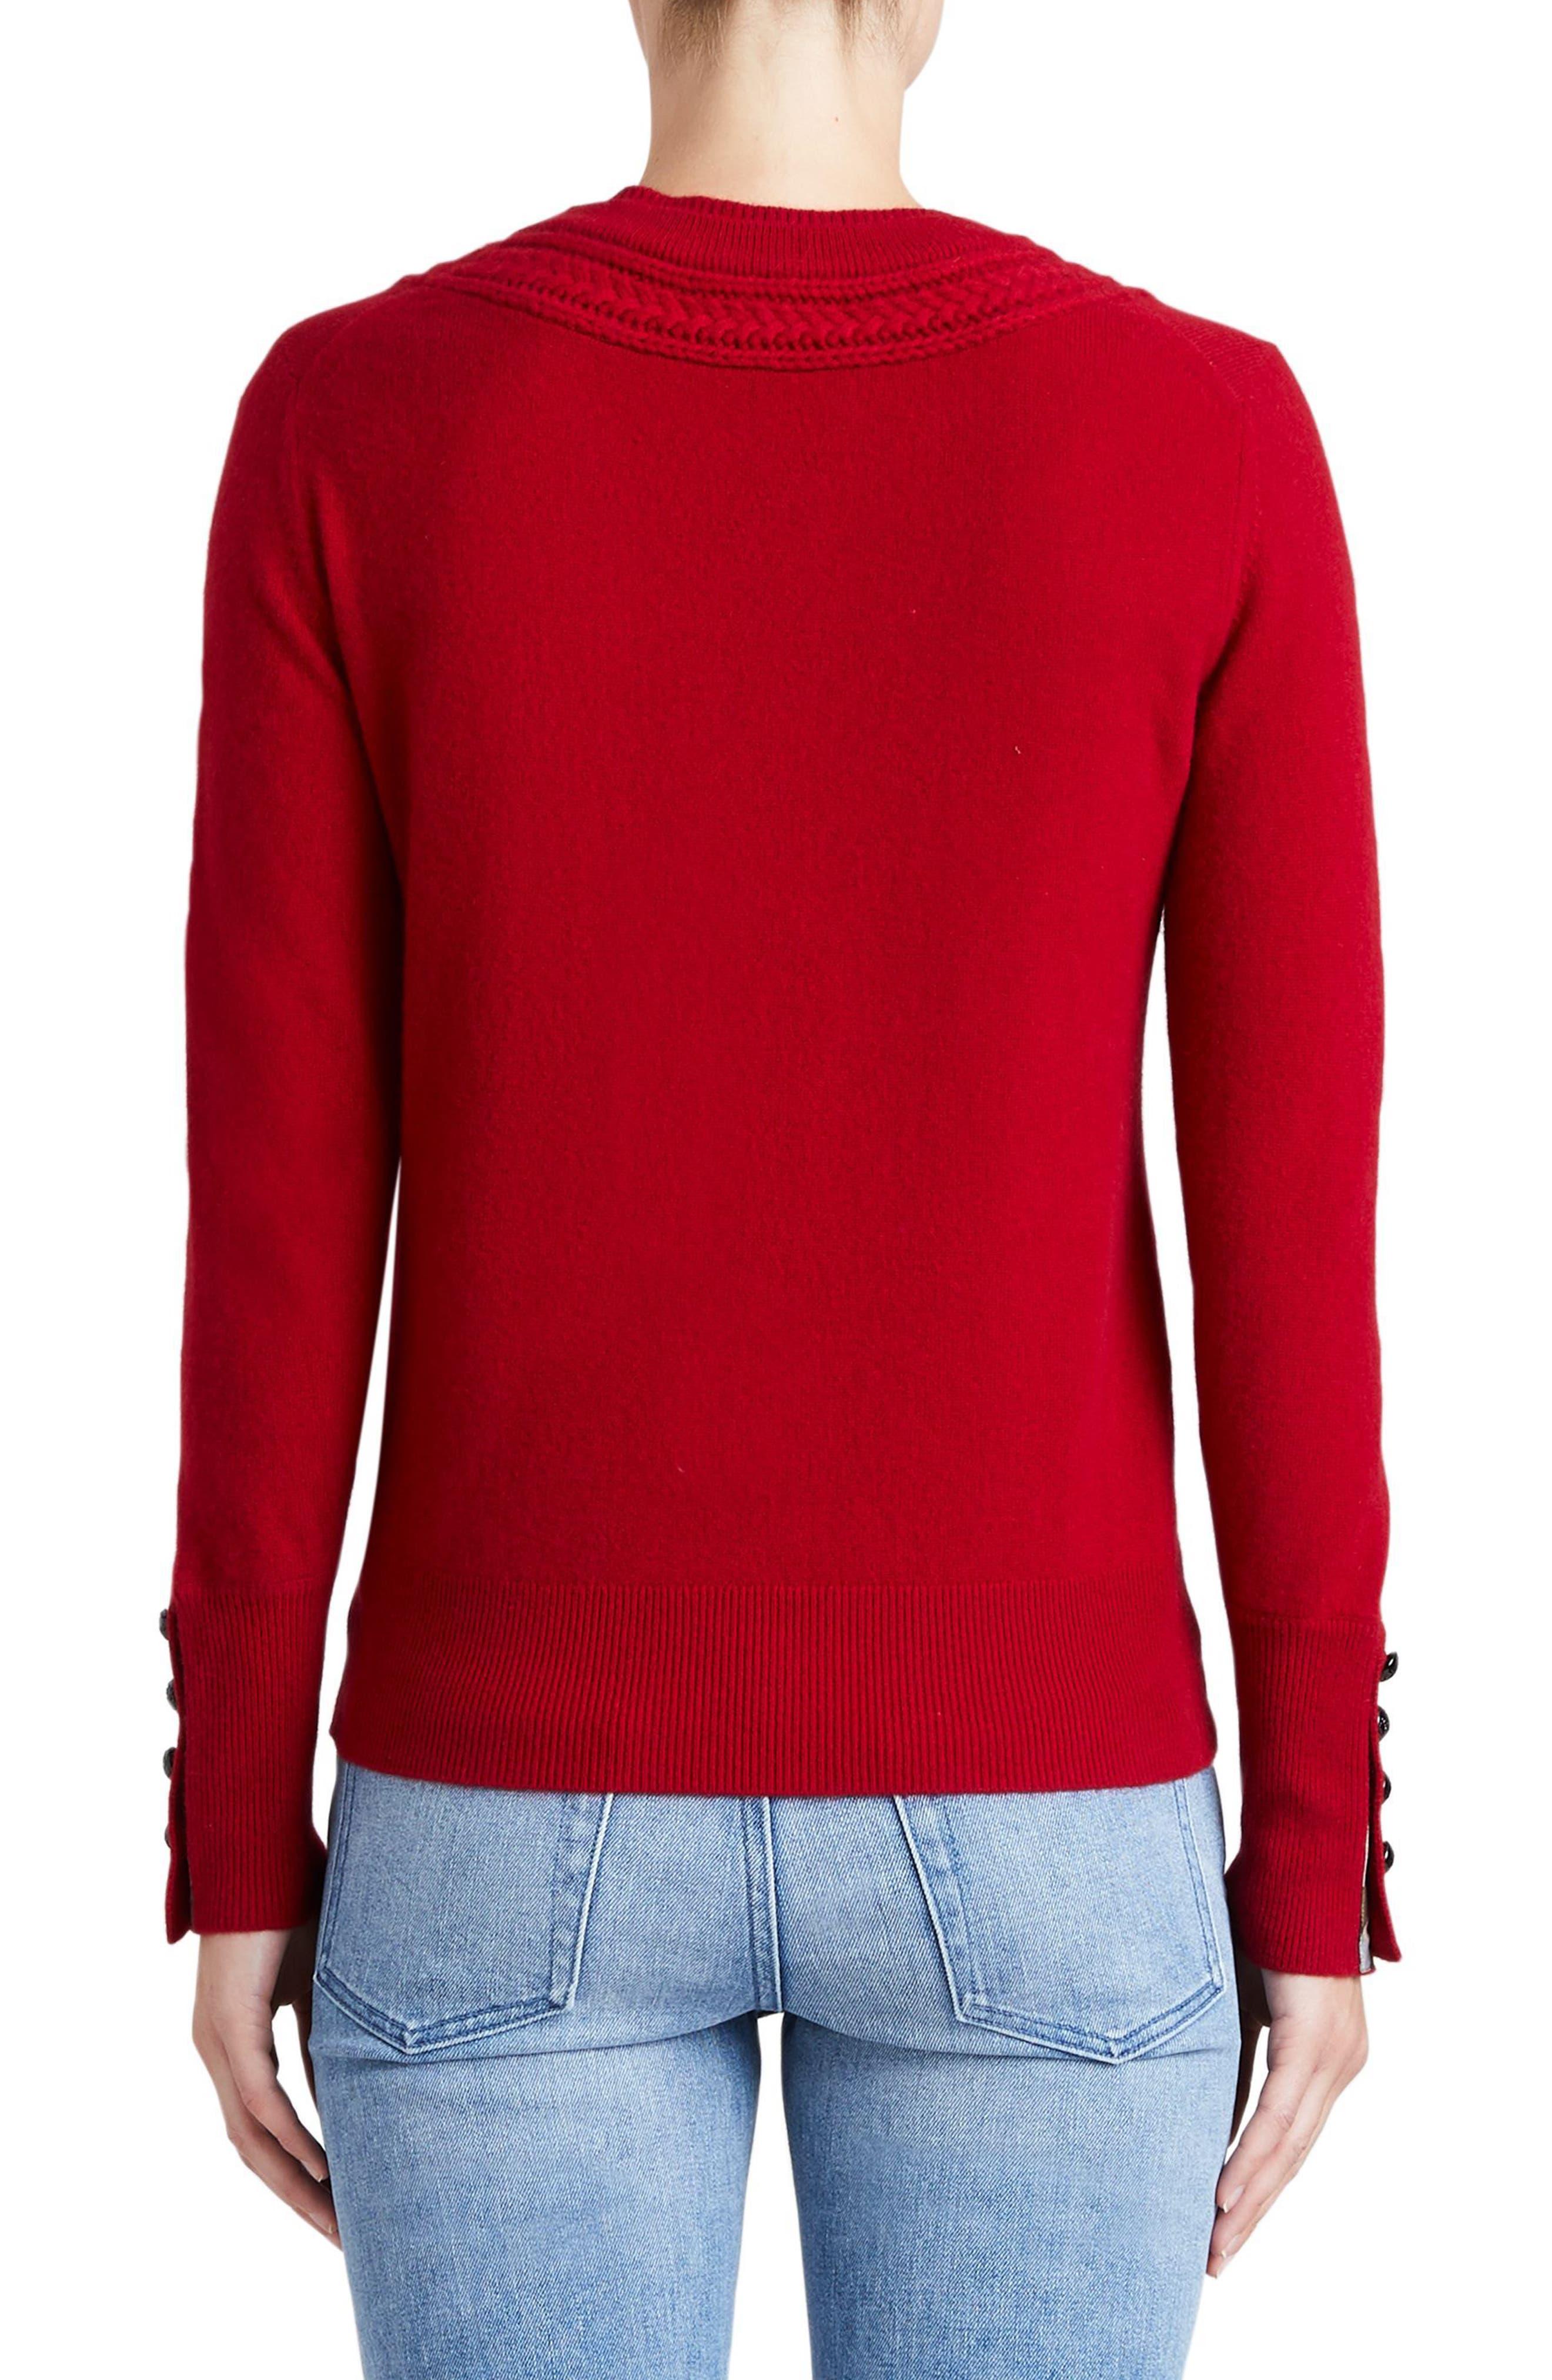 Carapelle Cashmere Sweater,                             Alternate thumbnail 6, color,